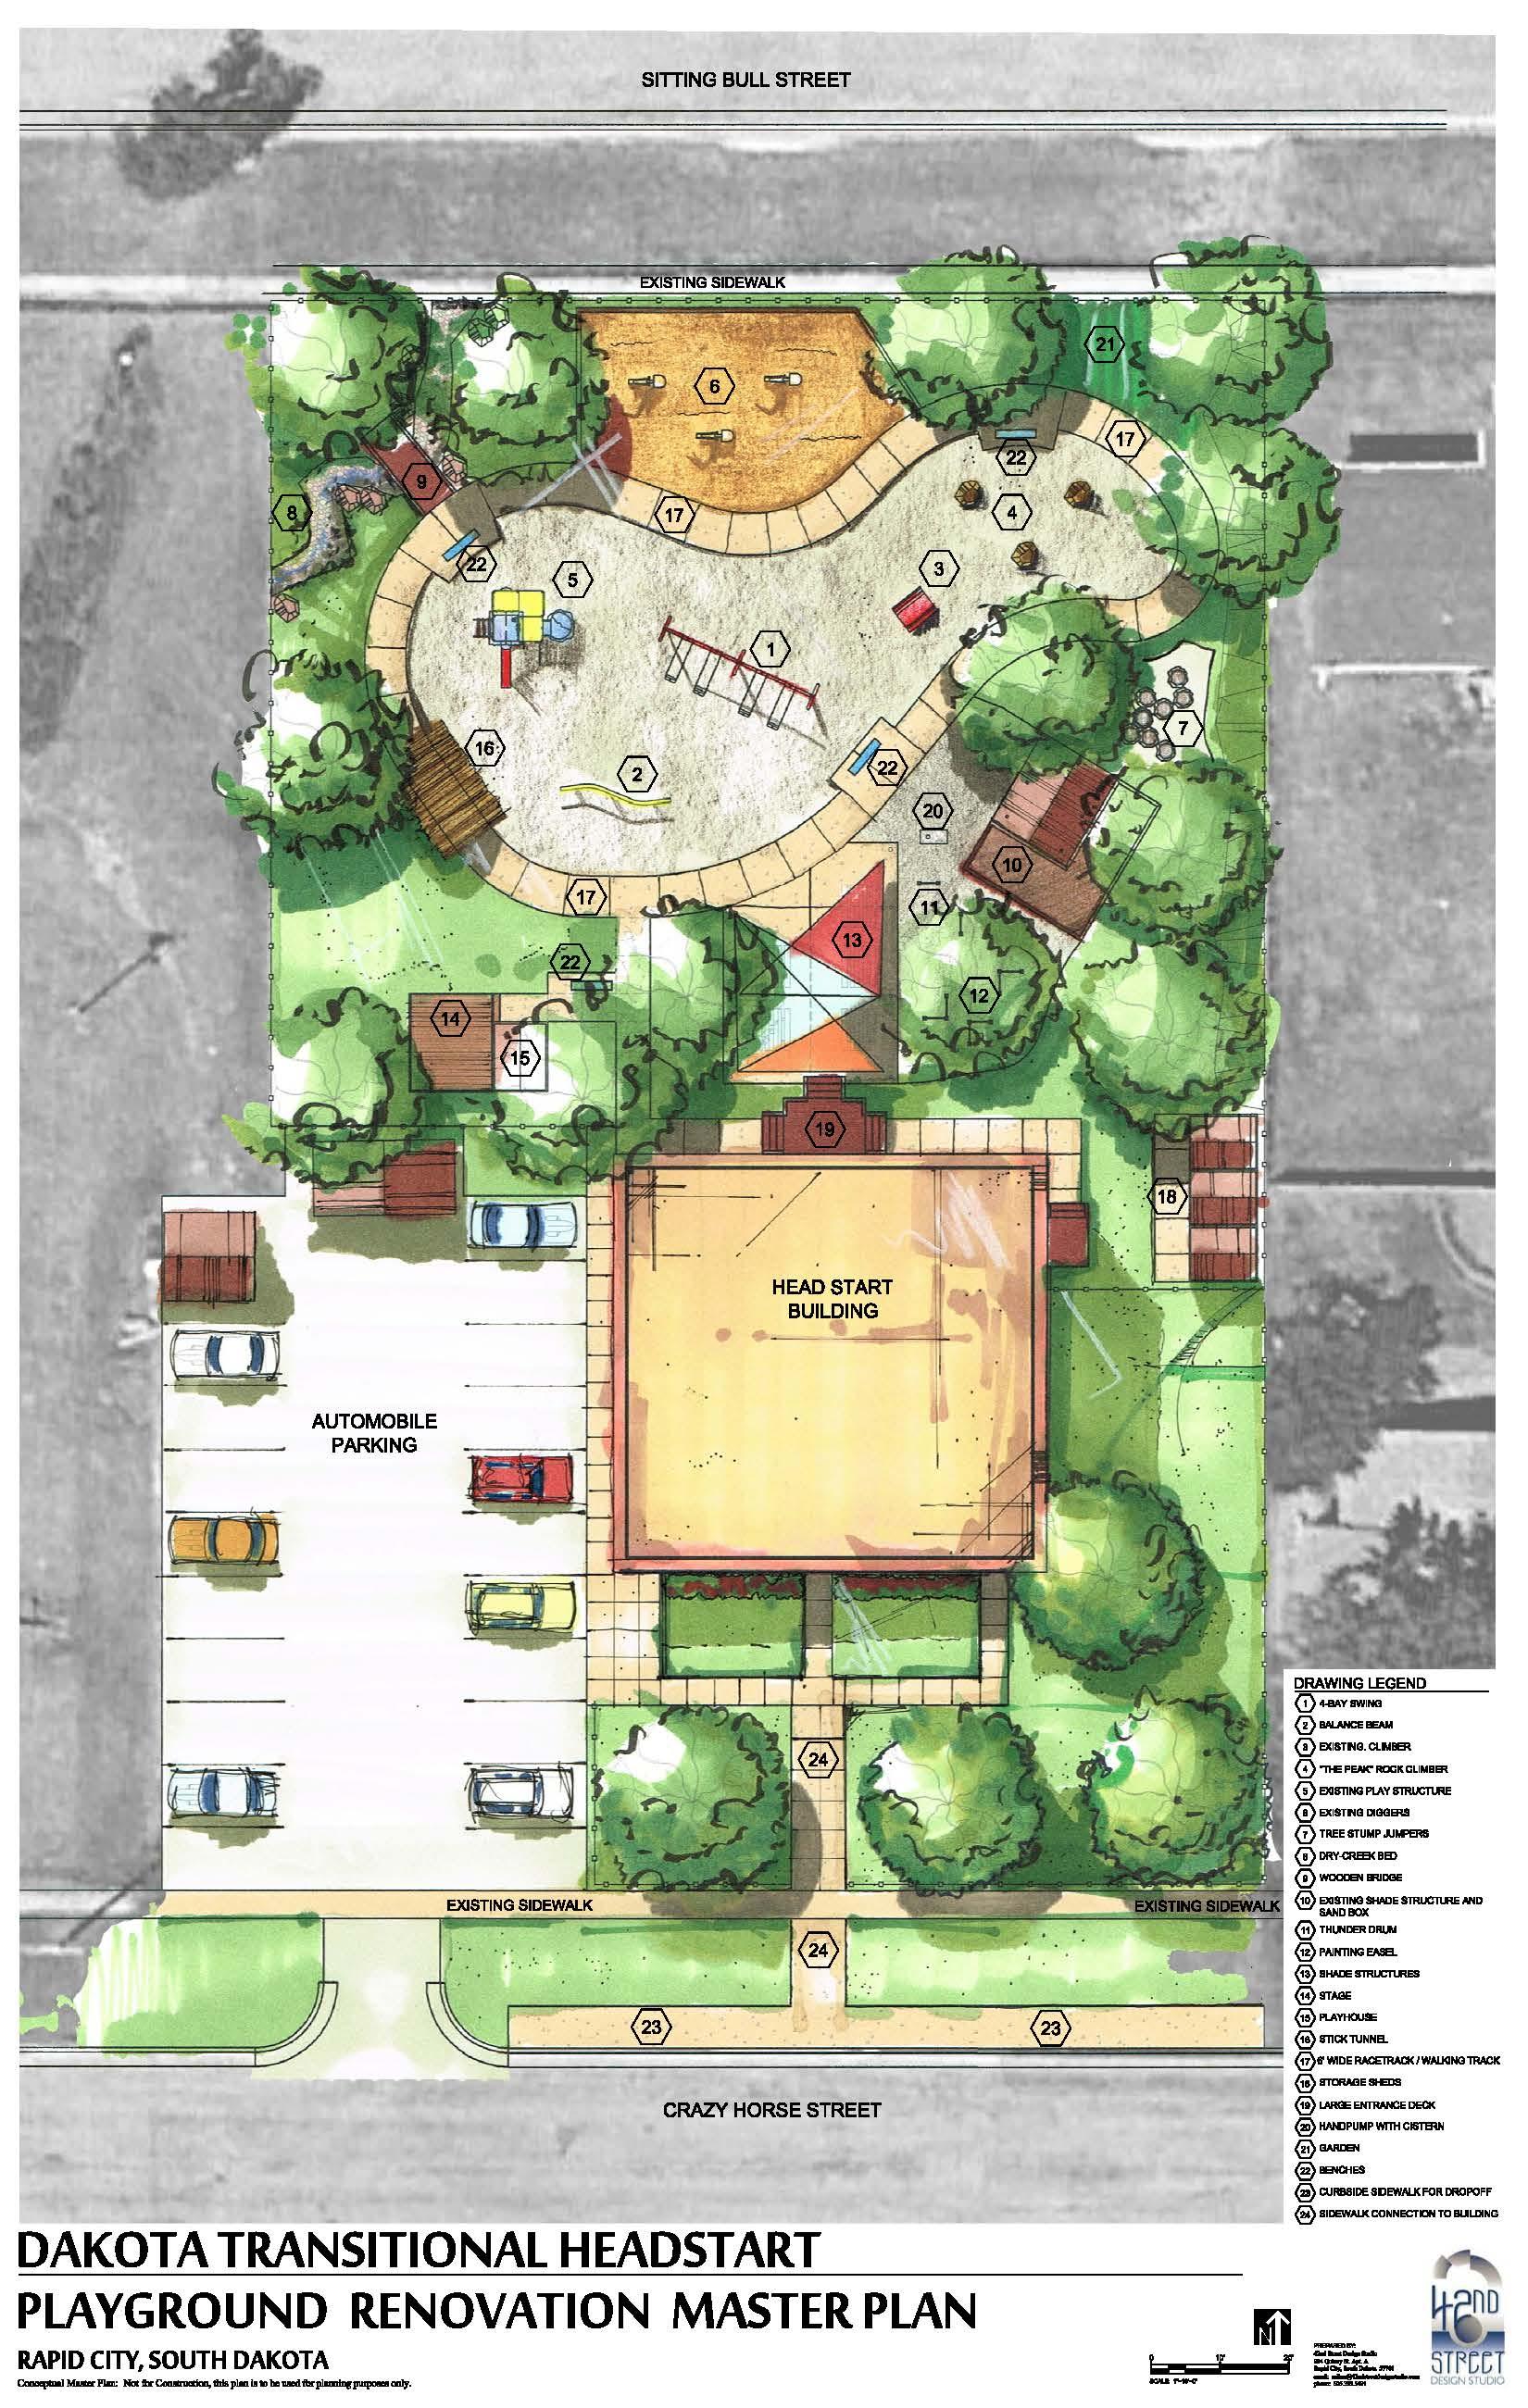 Playground Renovation Master Plan